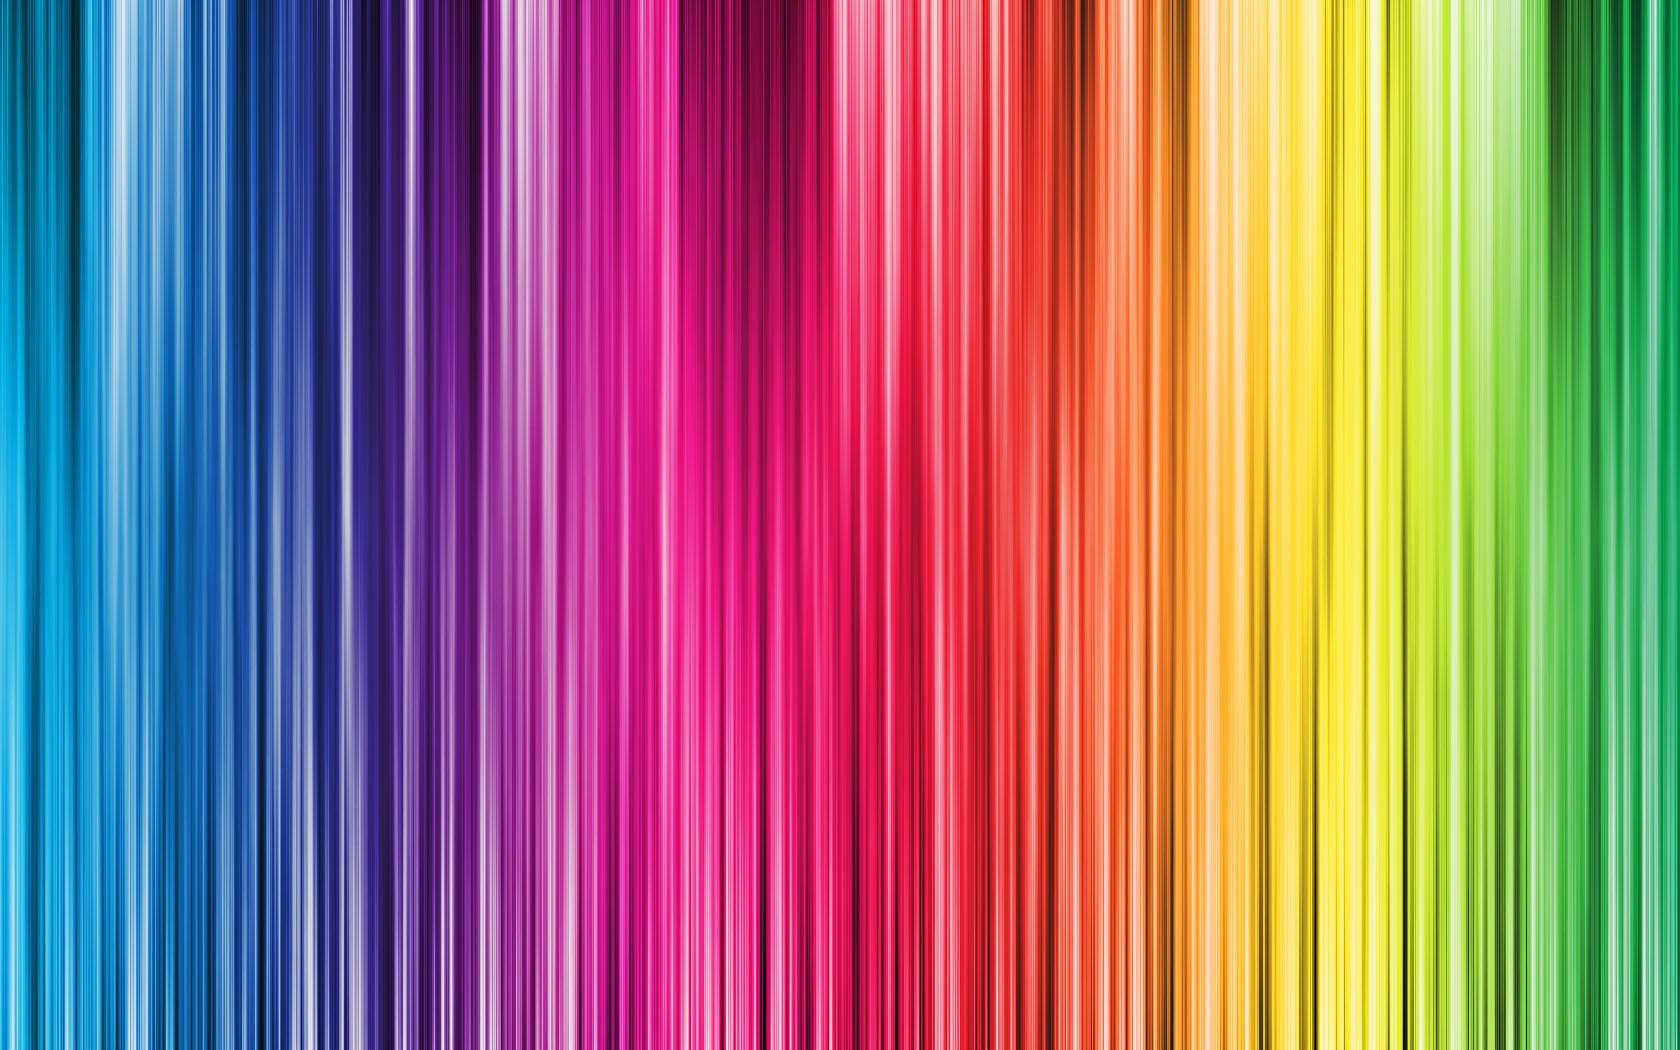 Iphone wallpaper chinese - Multi Color Background Wallpapersafari